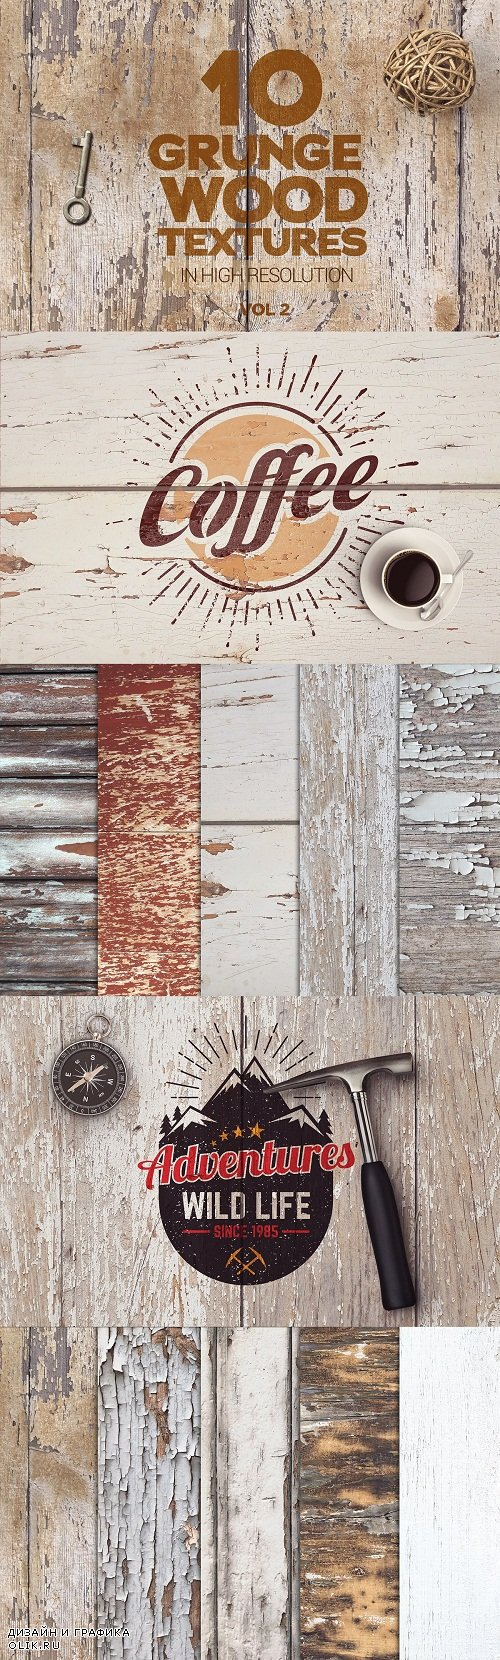 Grunge Wood Textures x10 vol2 - 3775156